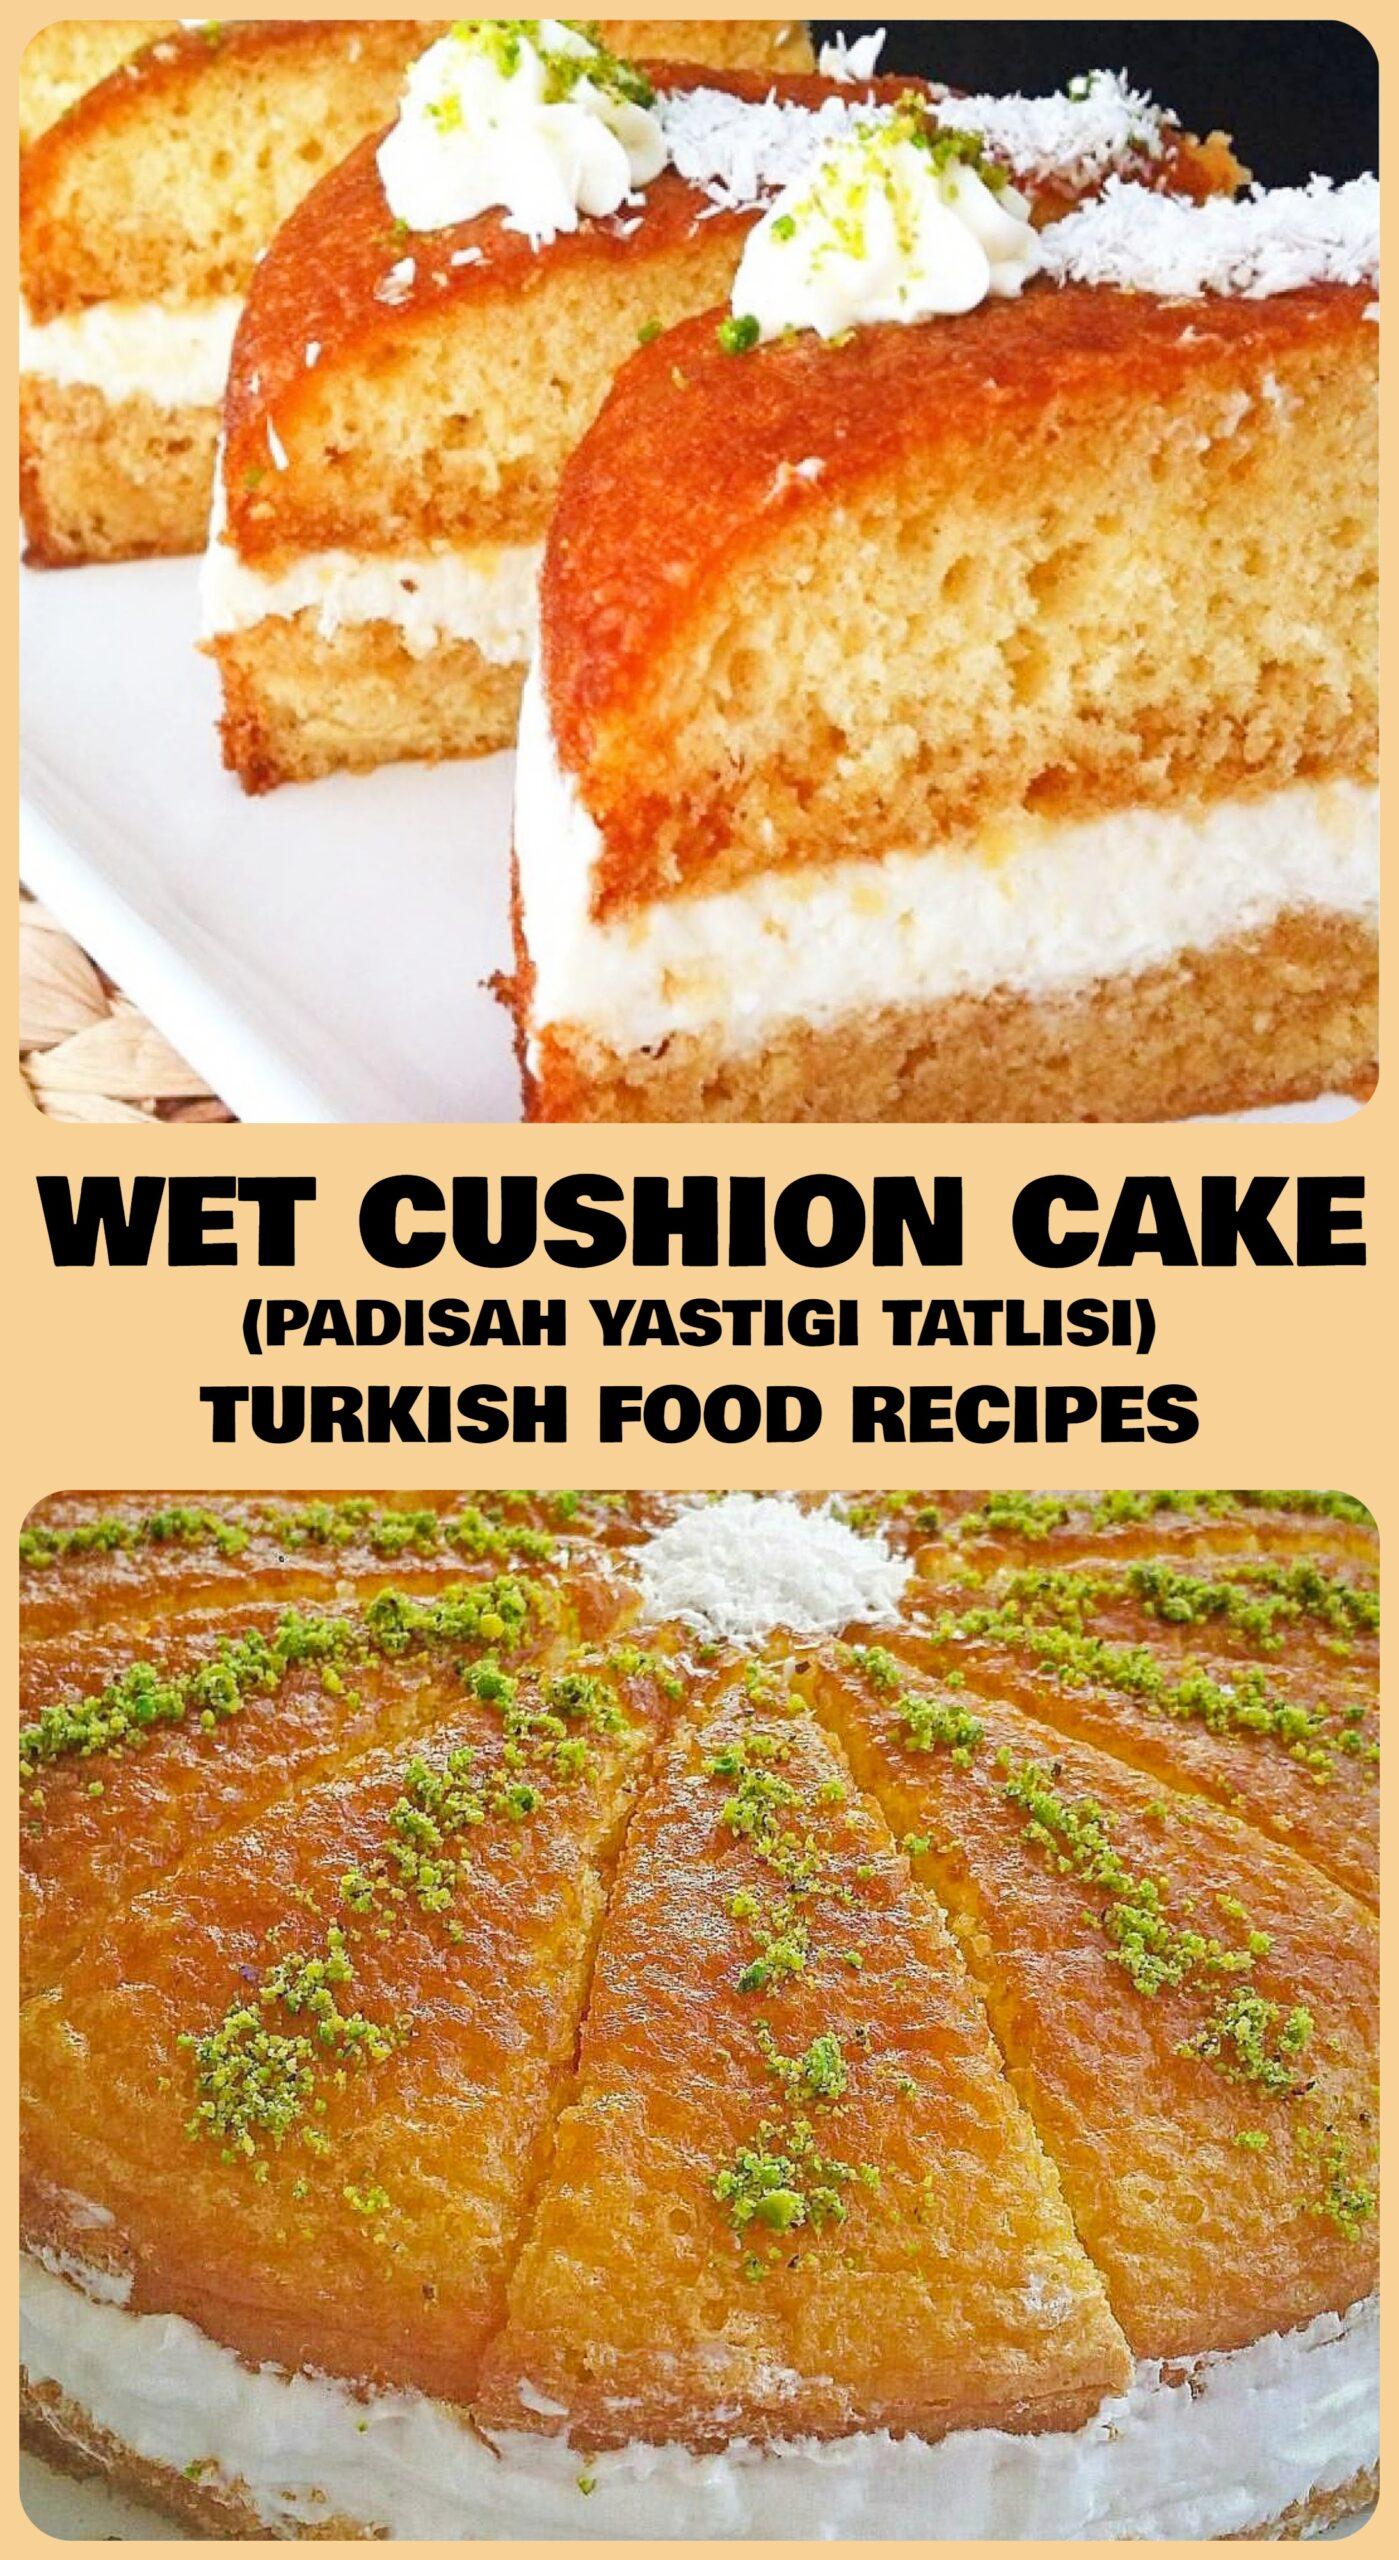 Wet Cushion Cake - Padisah Yastigi Tatlisi Recipe